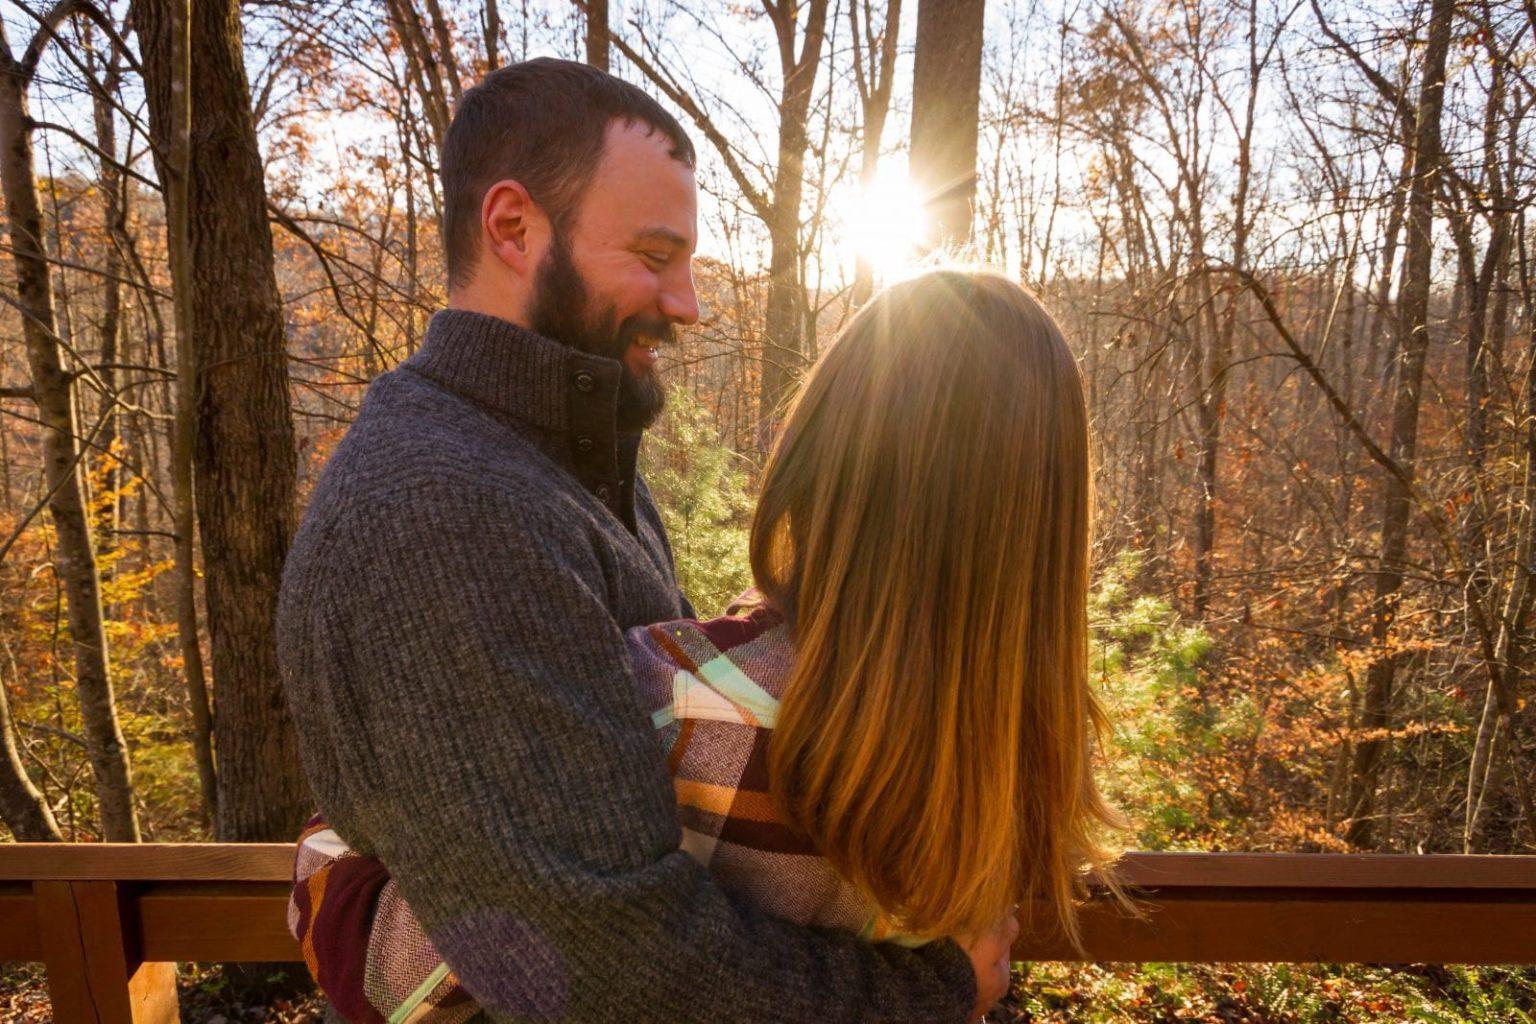 Honeymoons and Romantic Getaways in WV